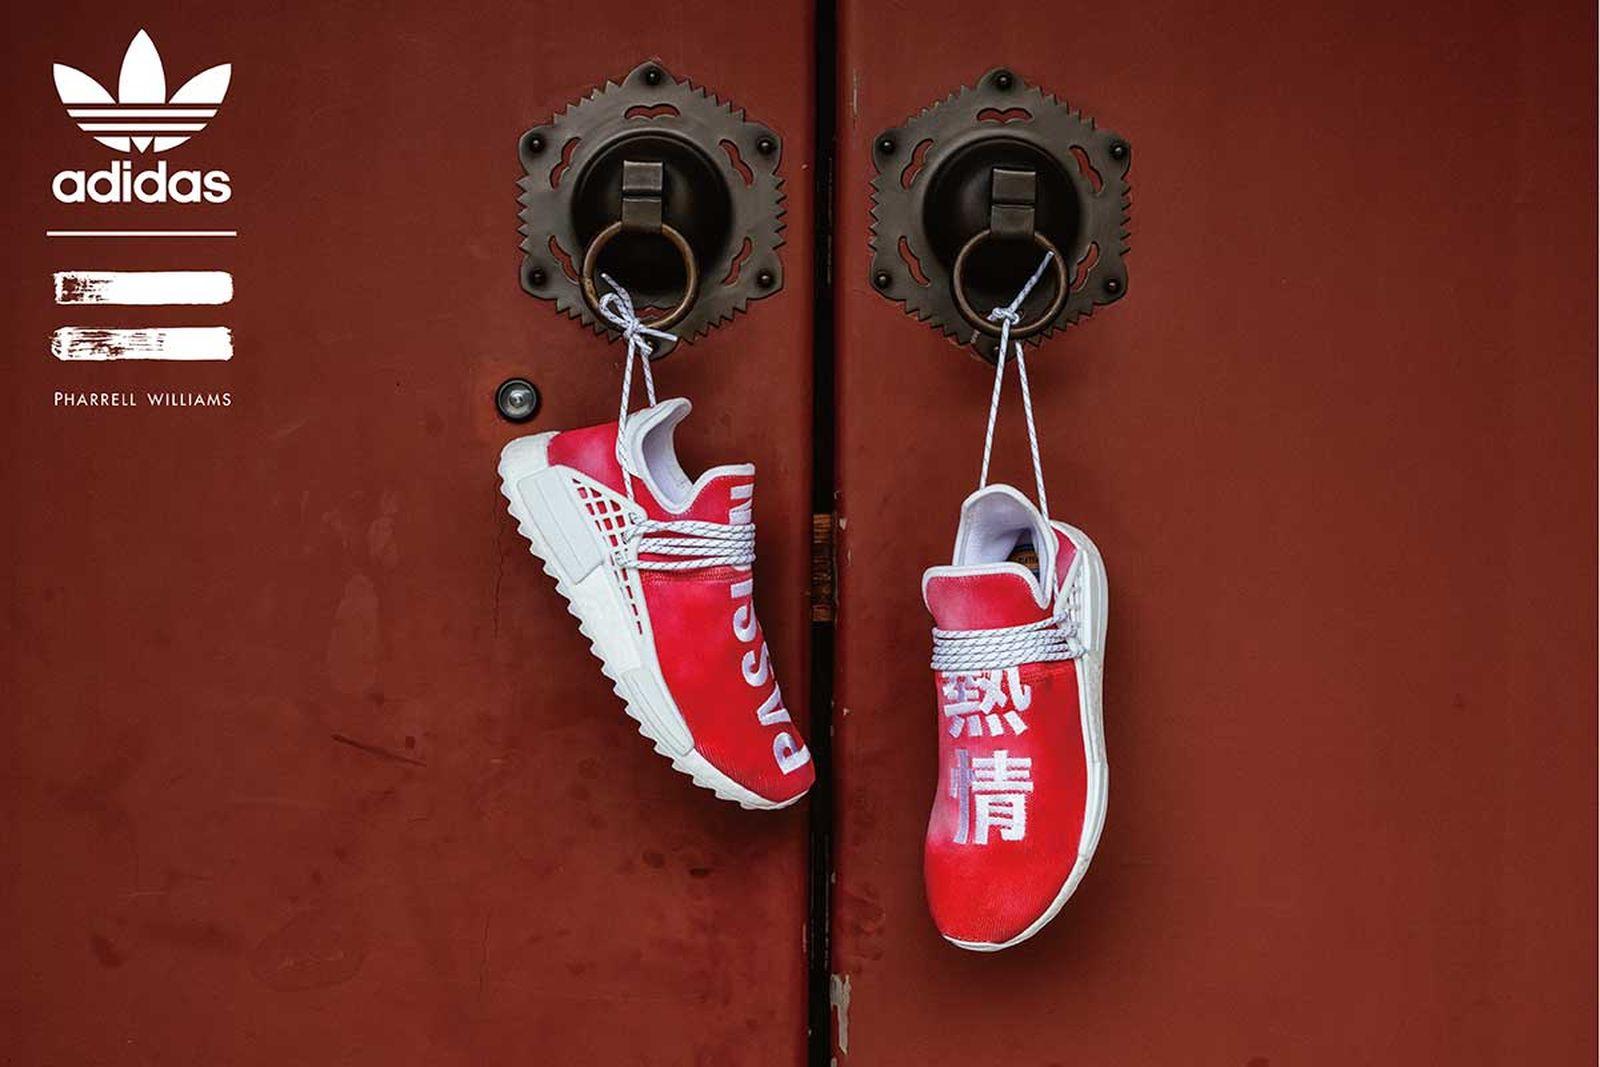 adidas-pharrell-williams-hu-nmd-china-release-price-05